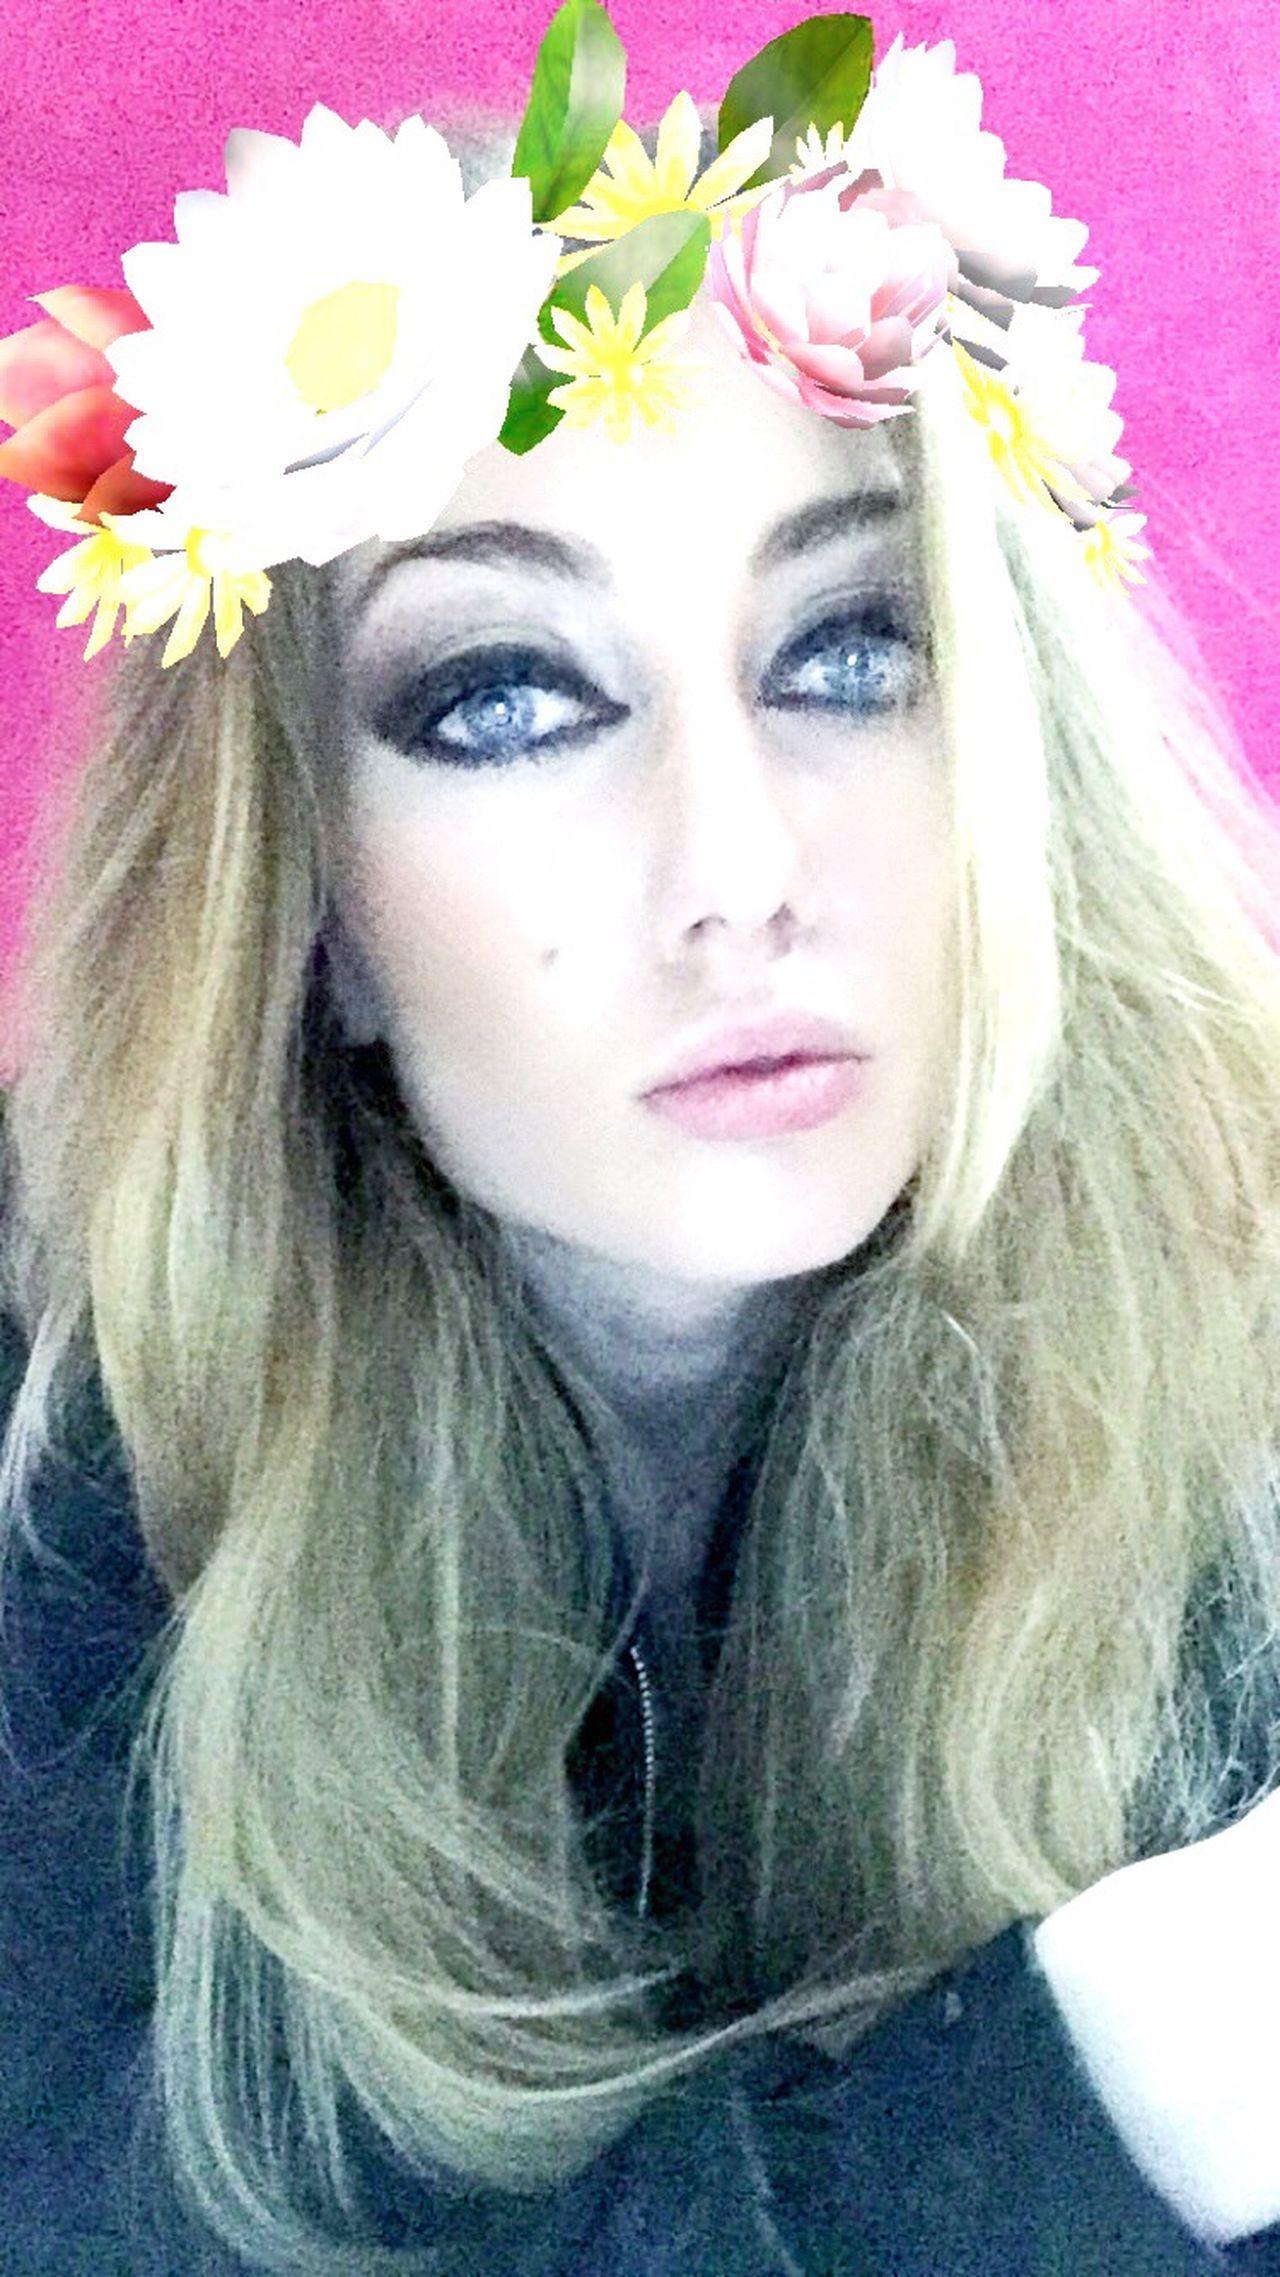 Snapchat SnapchatFilterIsGoodToMe Lolololololol Makeupextreme Smokey Eyes Model